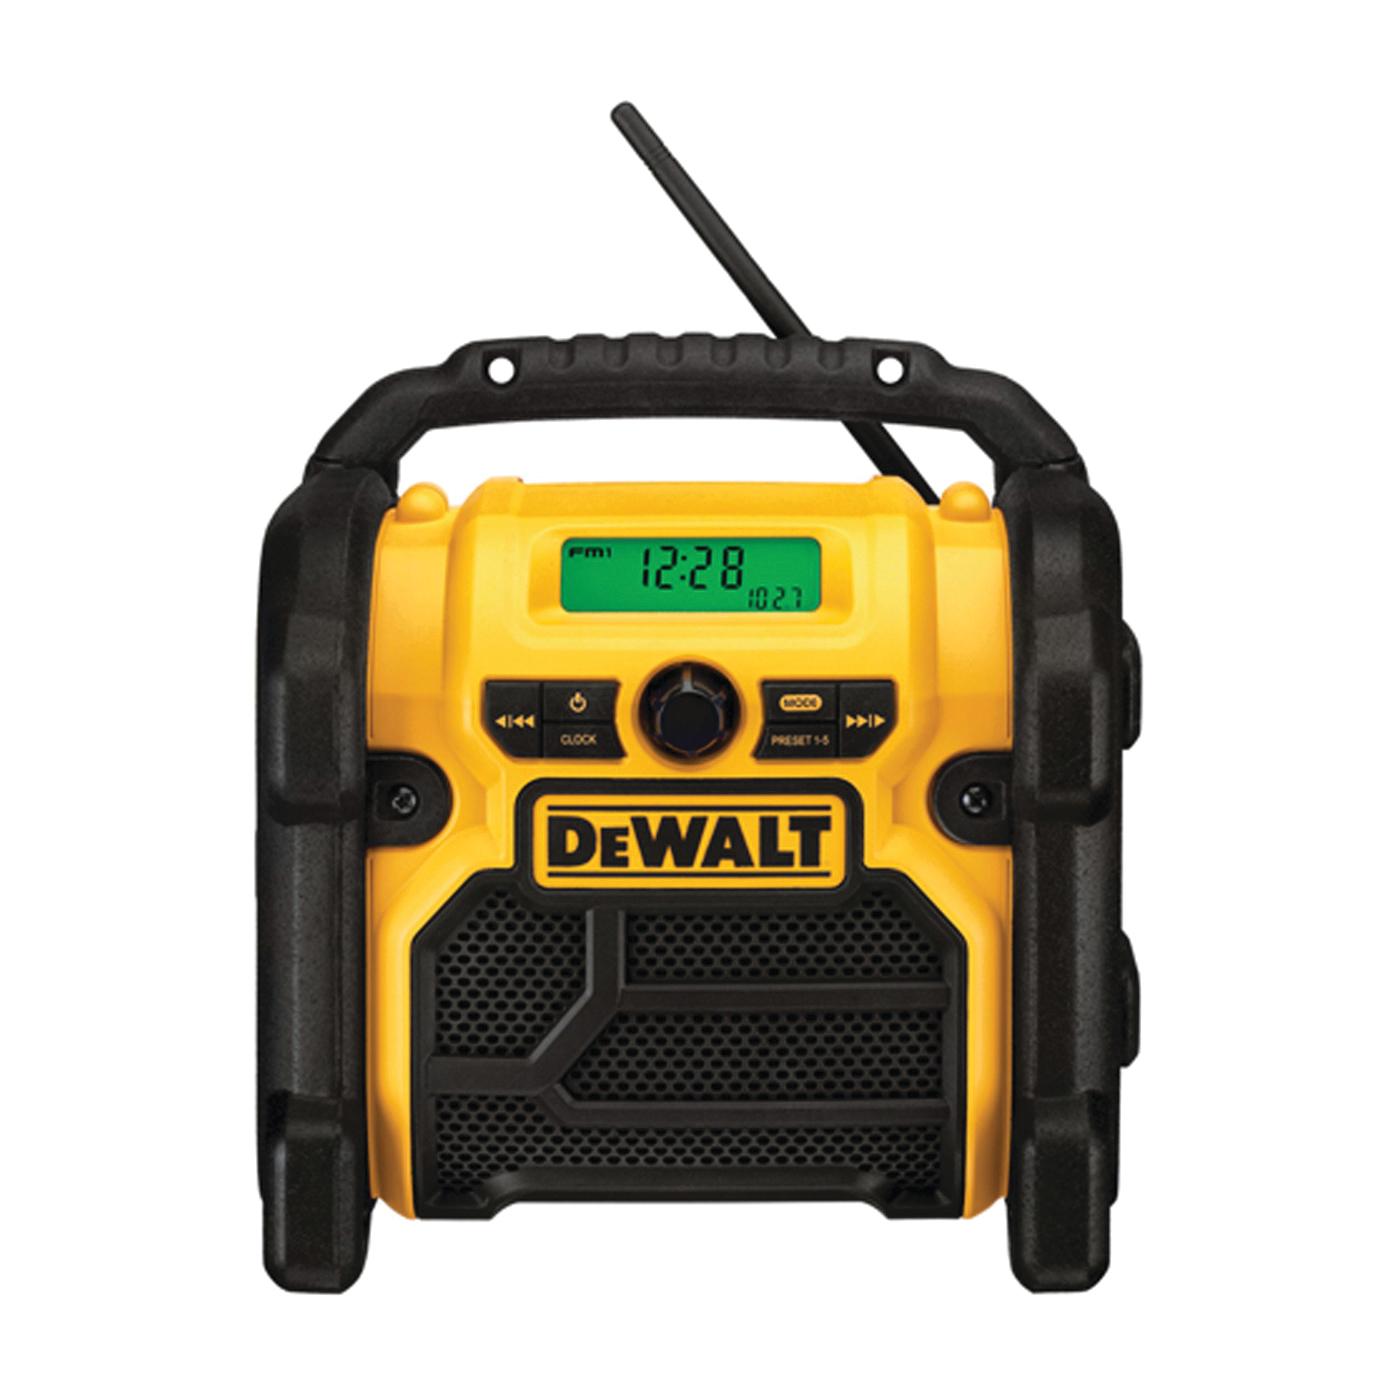 Picture of DeWALT DCR018 Worksite Radio, Bare Tool, 12, 18, 20 V Battery, 3, 1.5 Ah, Battery Included: No